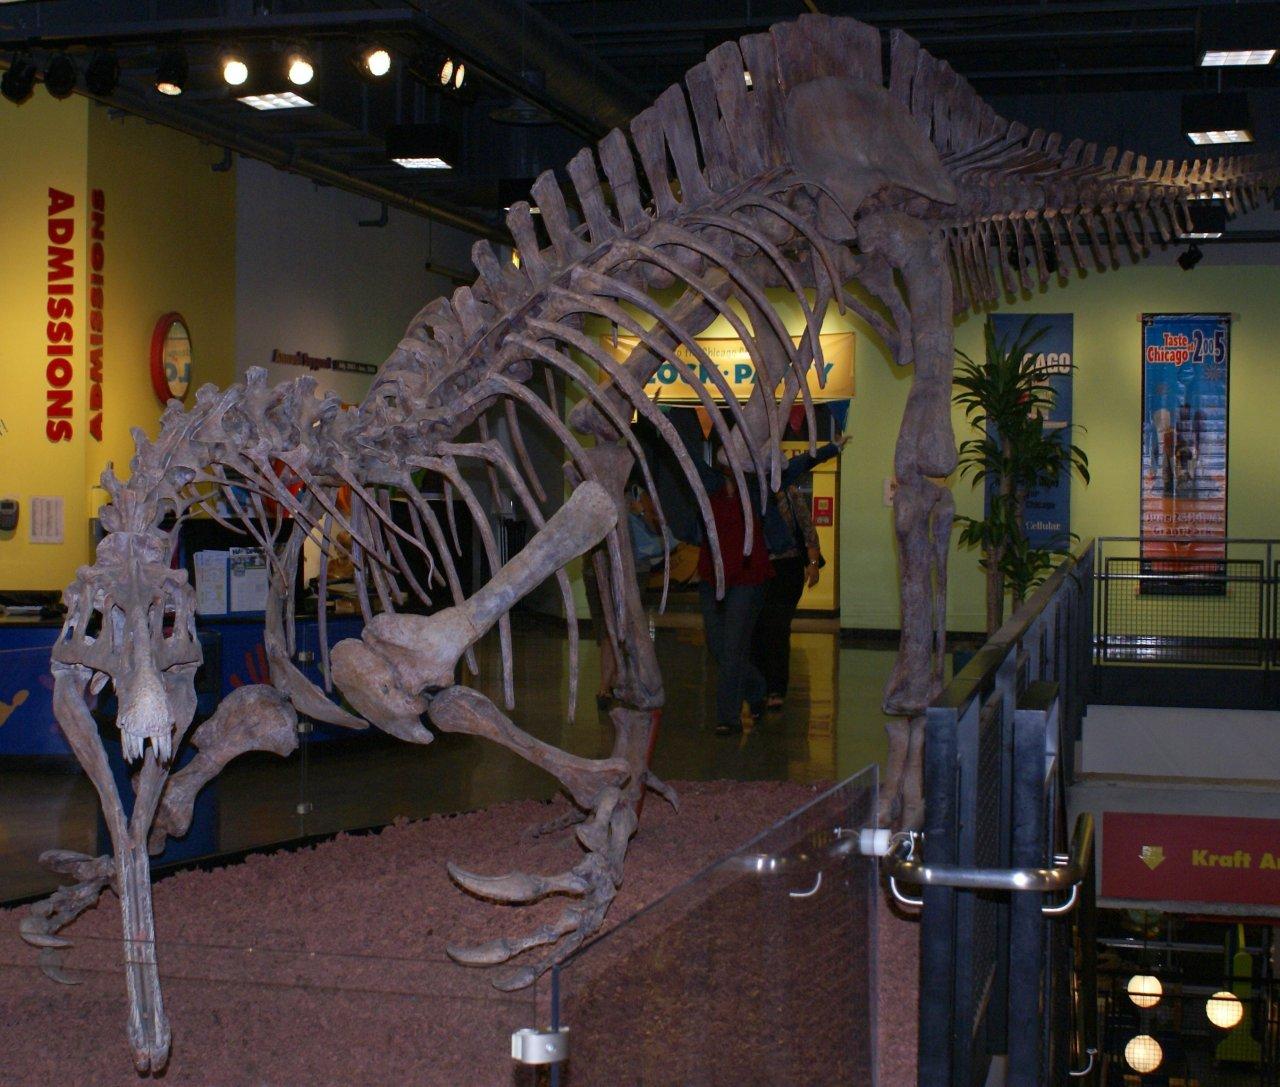 Suchomimus_skeleton-gil3ggu5a5.jpg